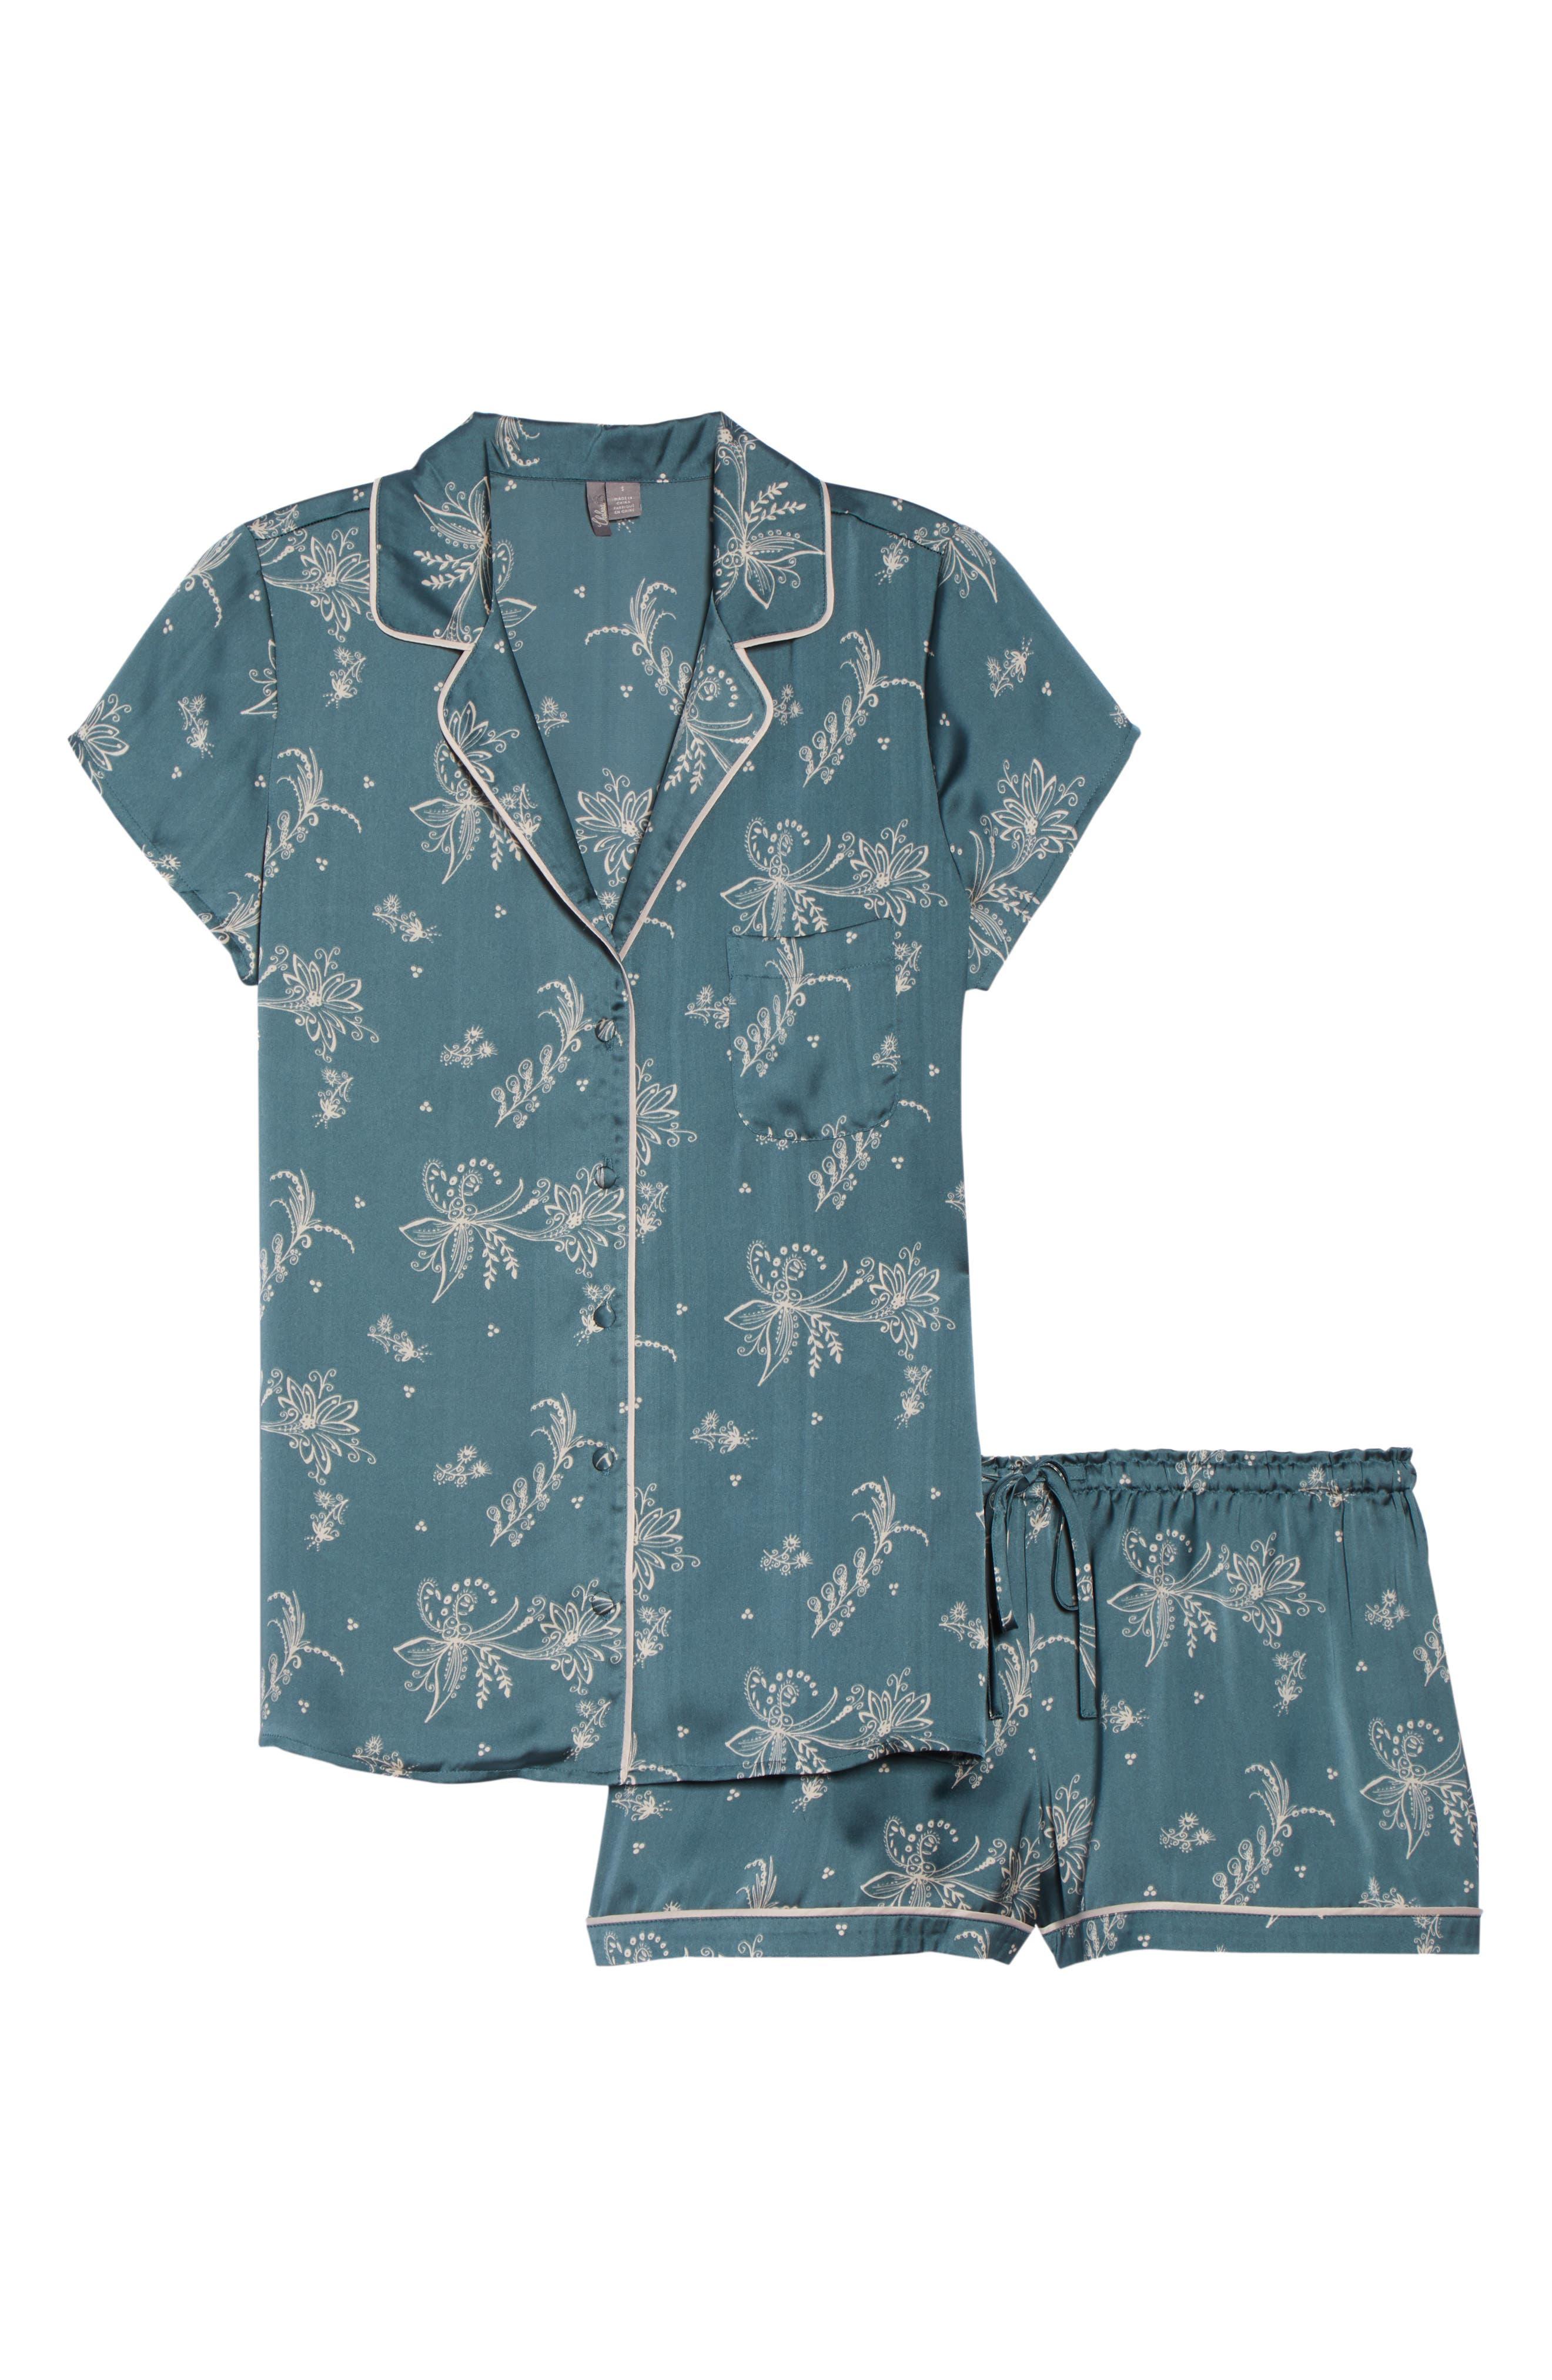 Satin Pajamas,                             Alternate thumbnail 6, color,                             BLUE GOBLIN FLIRTY FLORAL